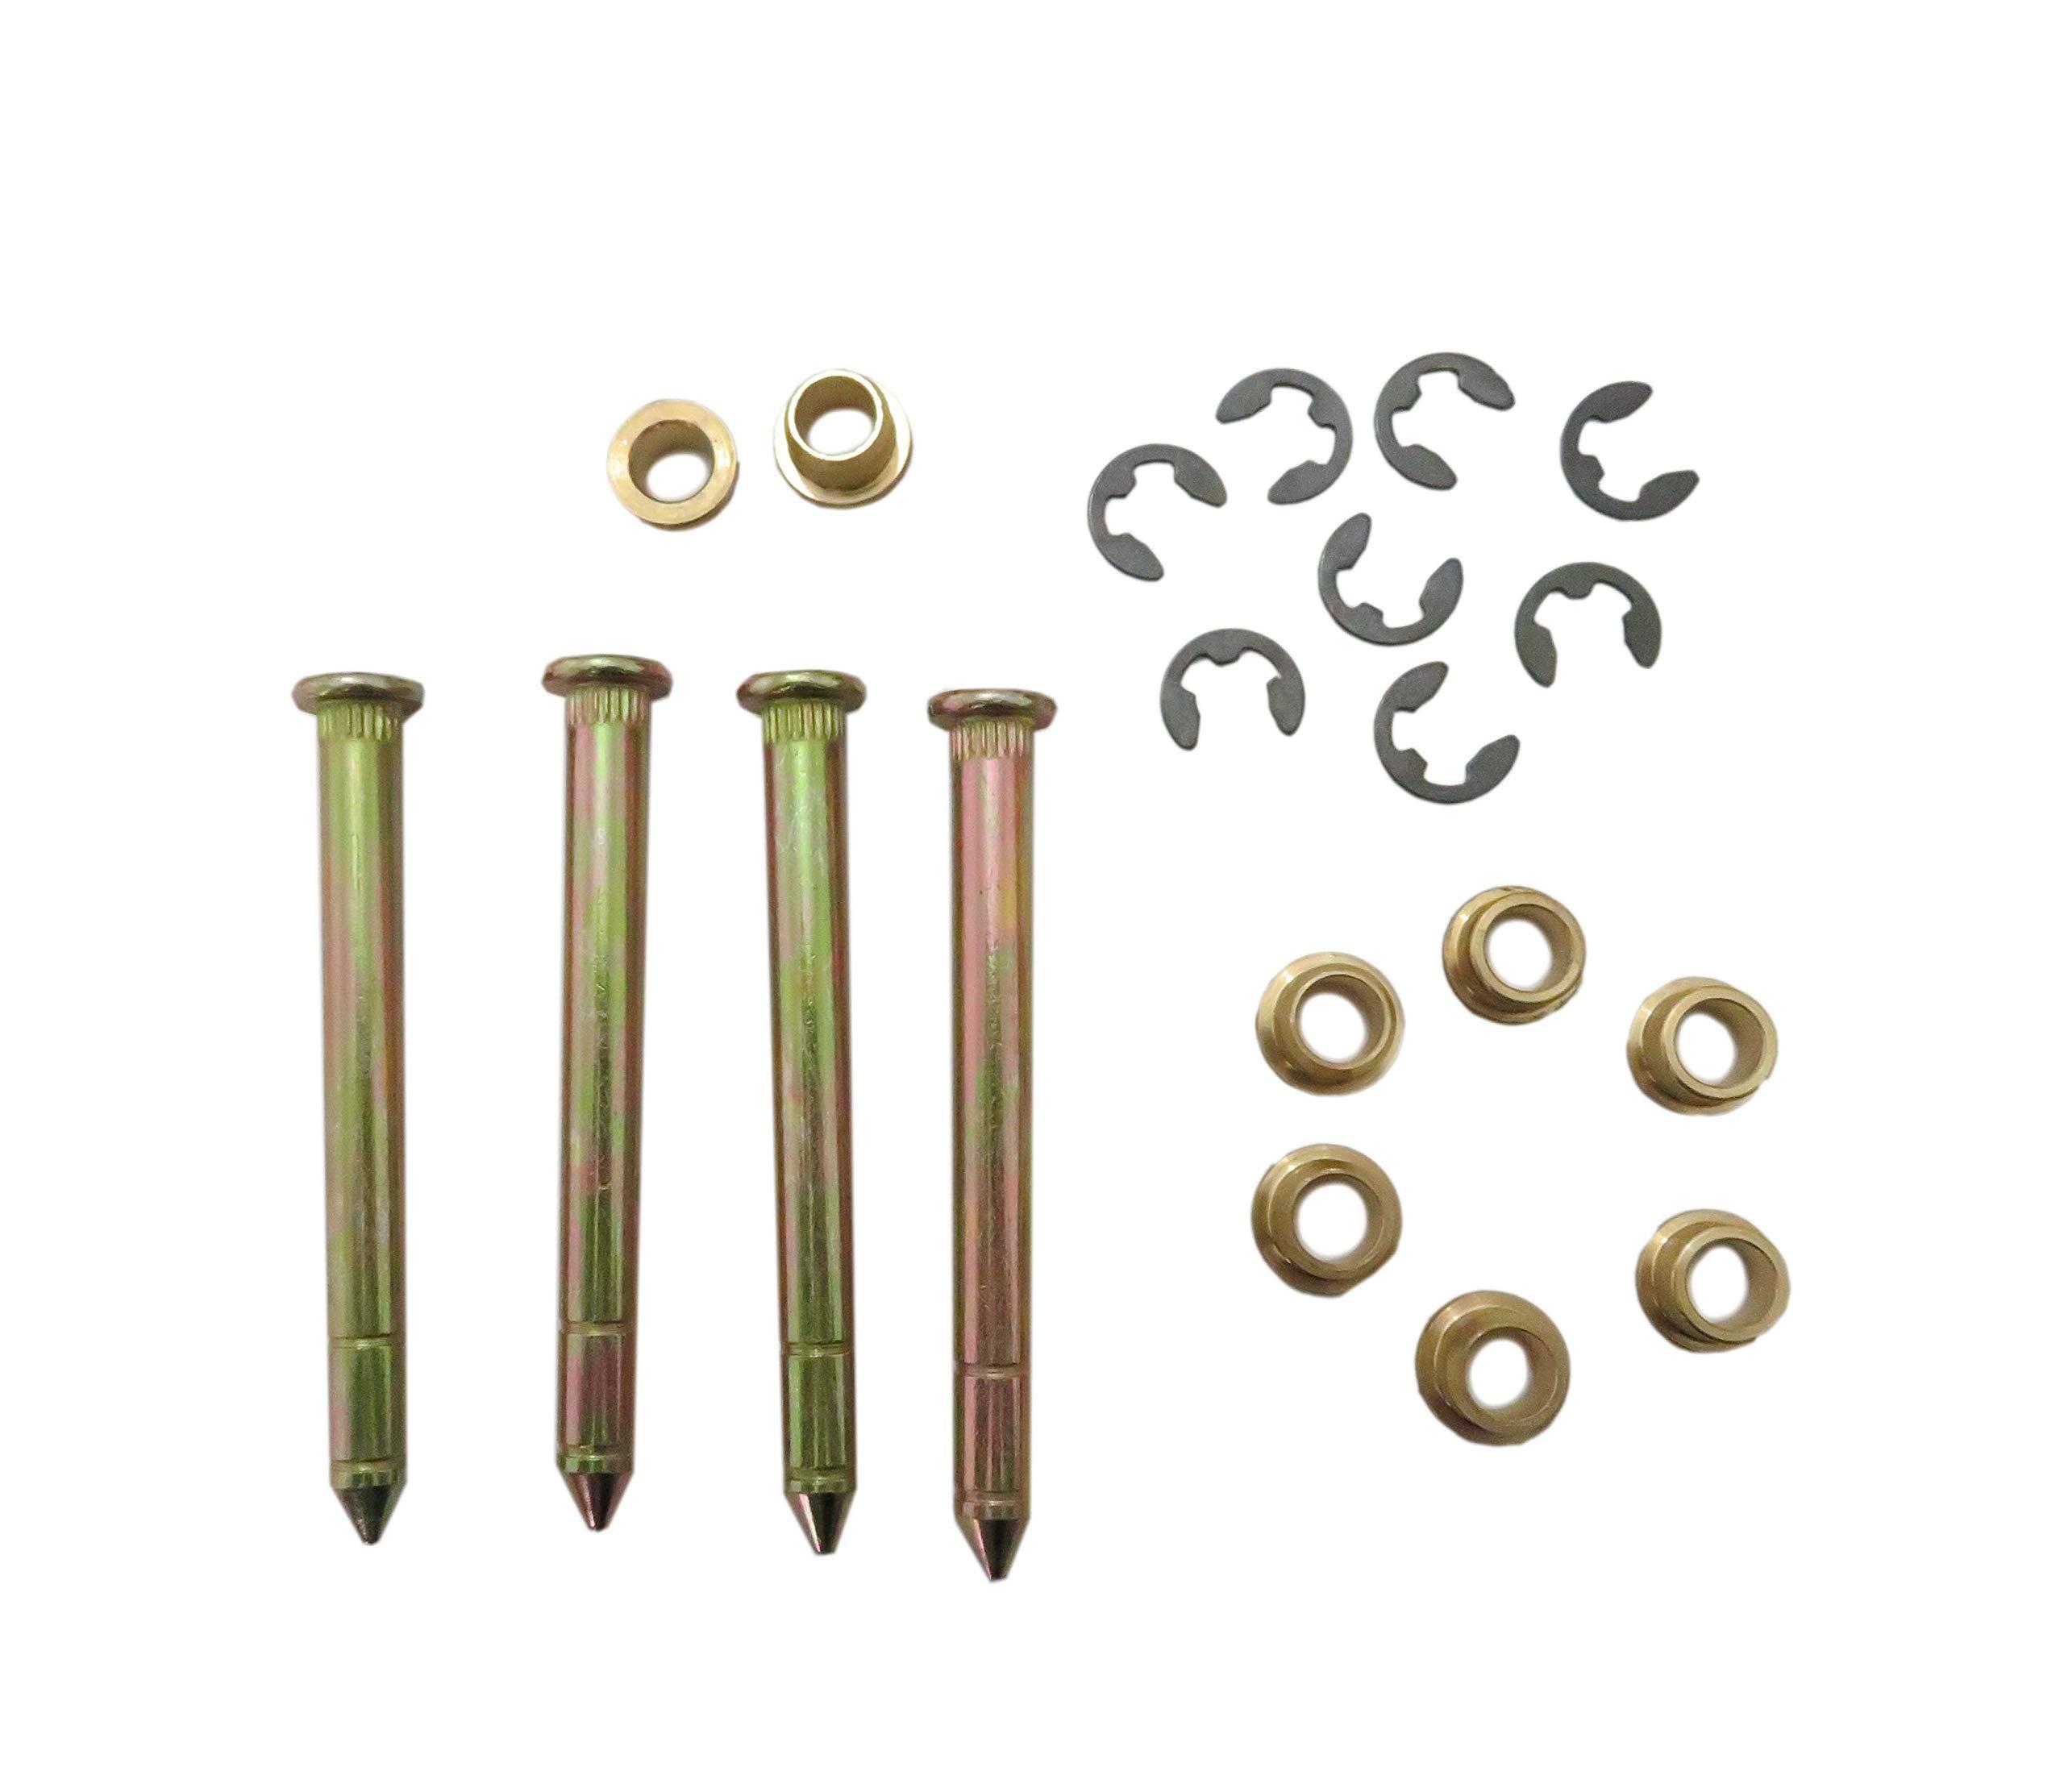 JEM&JULES Door Hinge Pins and Pin Bushing Repair Kit for Ford F150 F250 F350 Bronco SUV by JEM&JULES (Image #2)